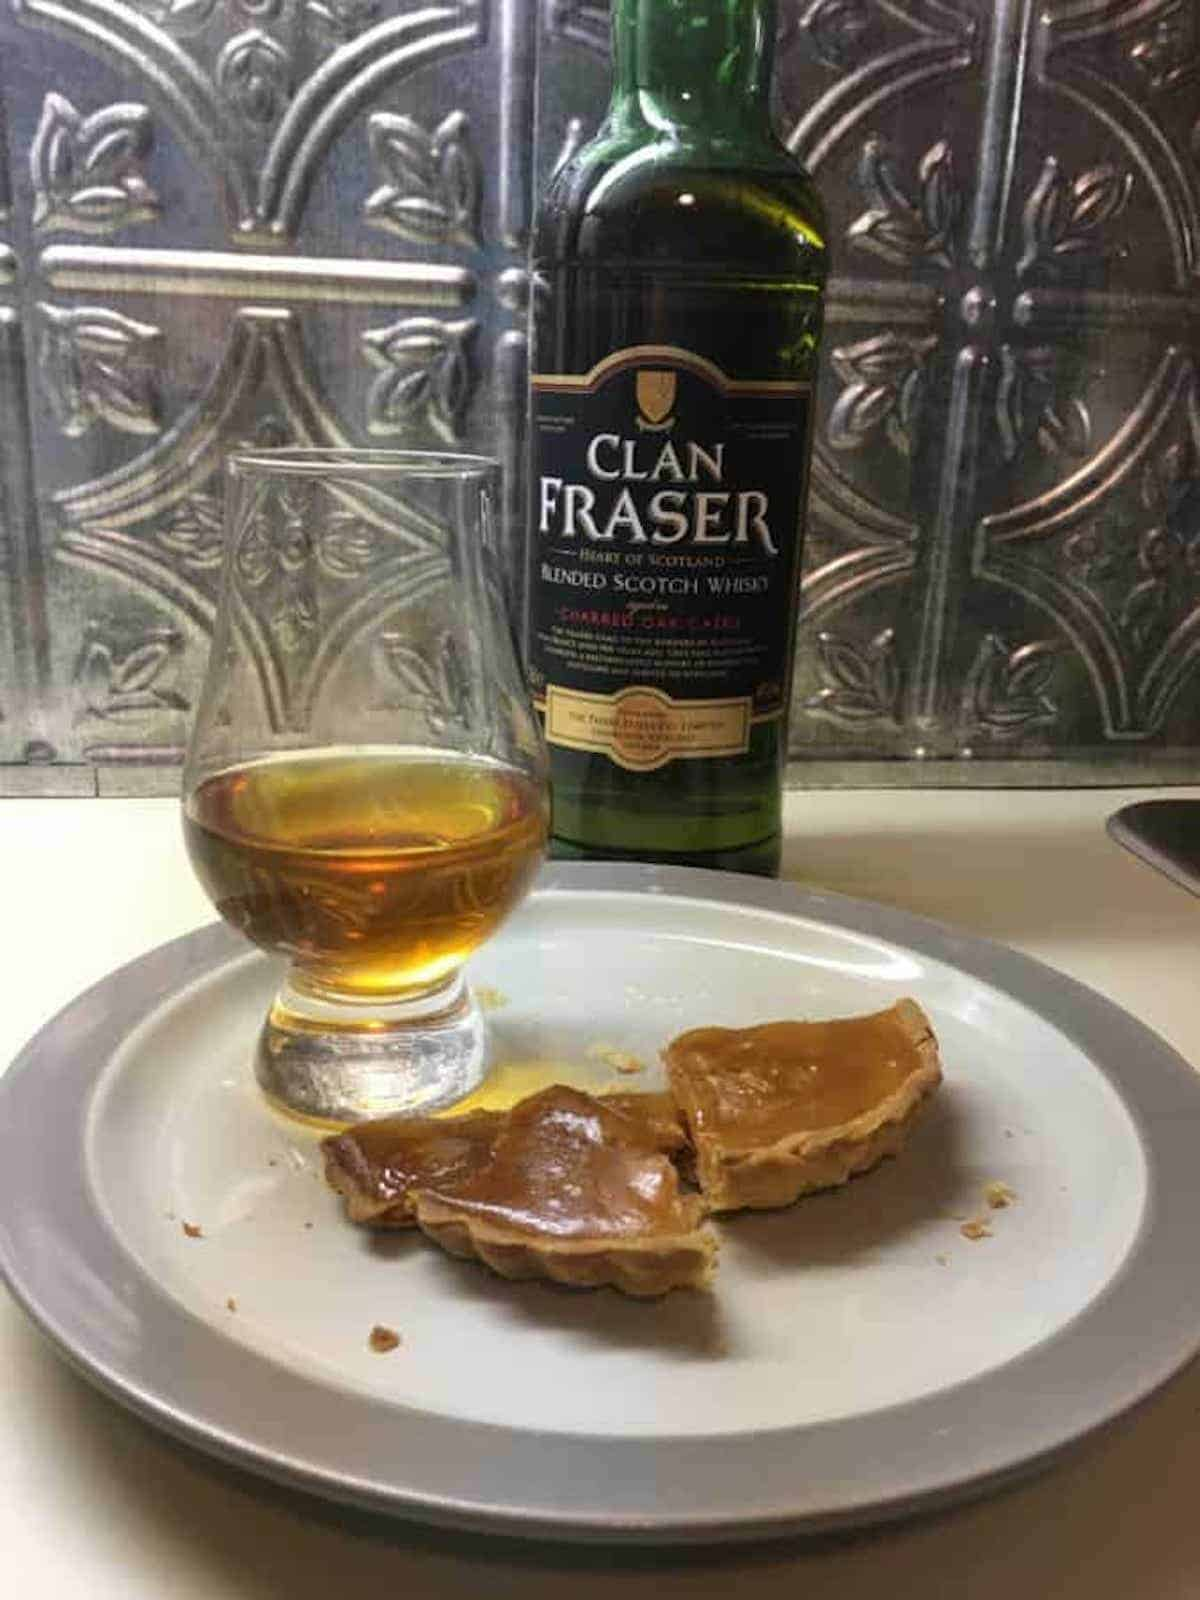 Clan Fraser blended scotch whisky with poured glass & apple cider tart